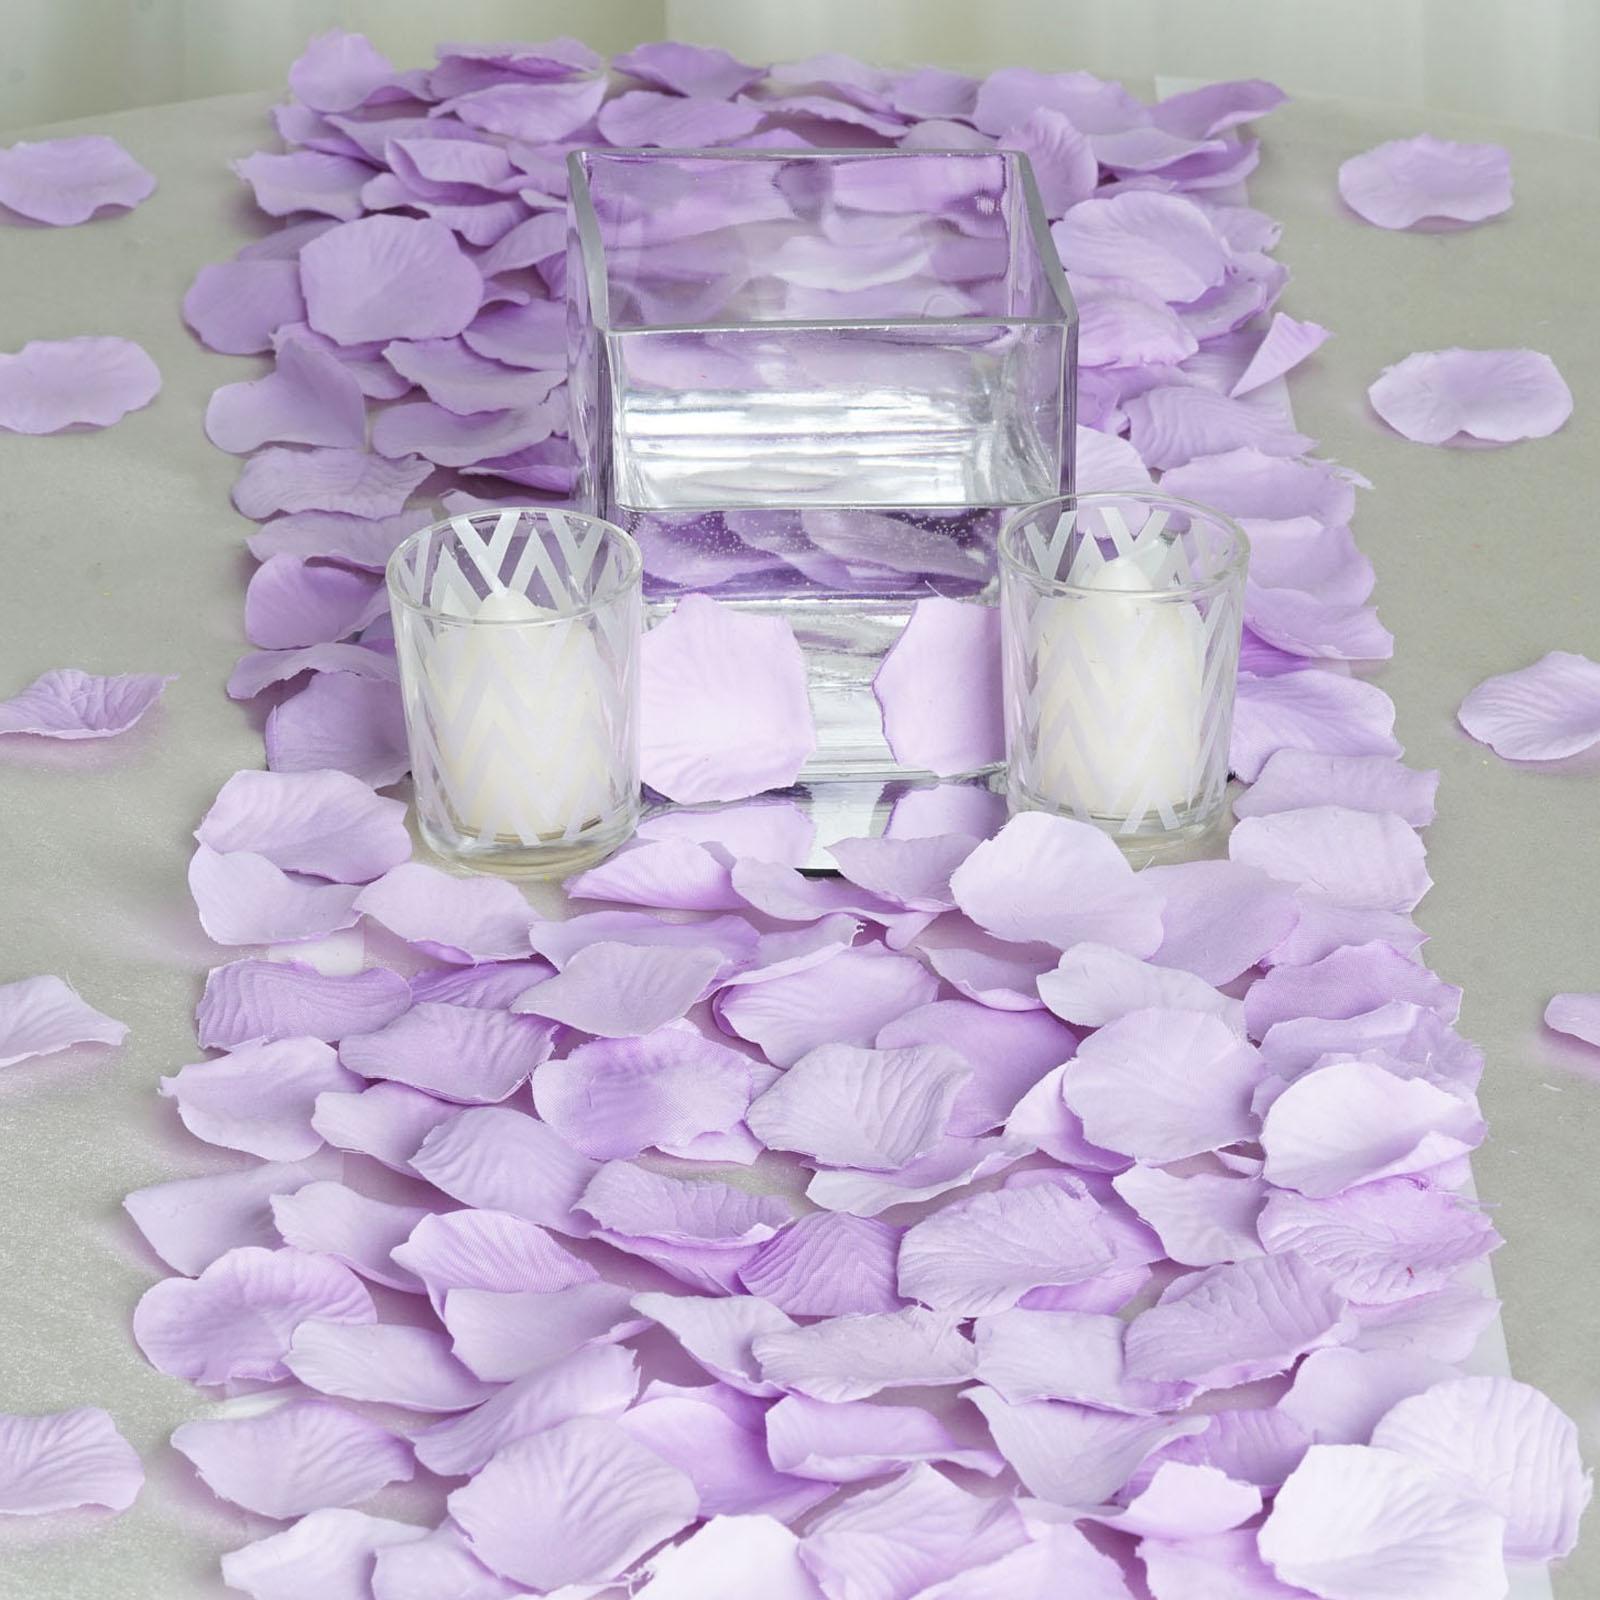 4000 silk rose petals wedding decorations favors wholesale. Black Bedroom Furniture Sets. Home Design Ideas